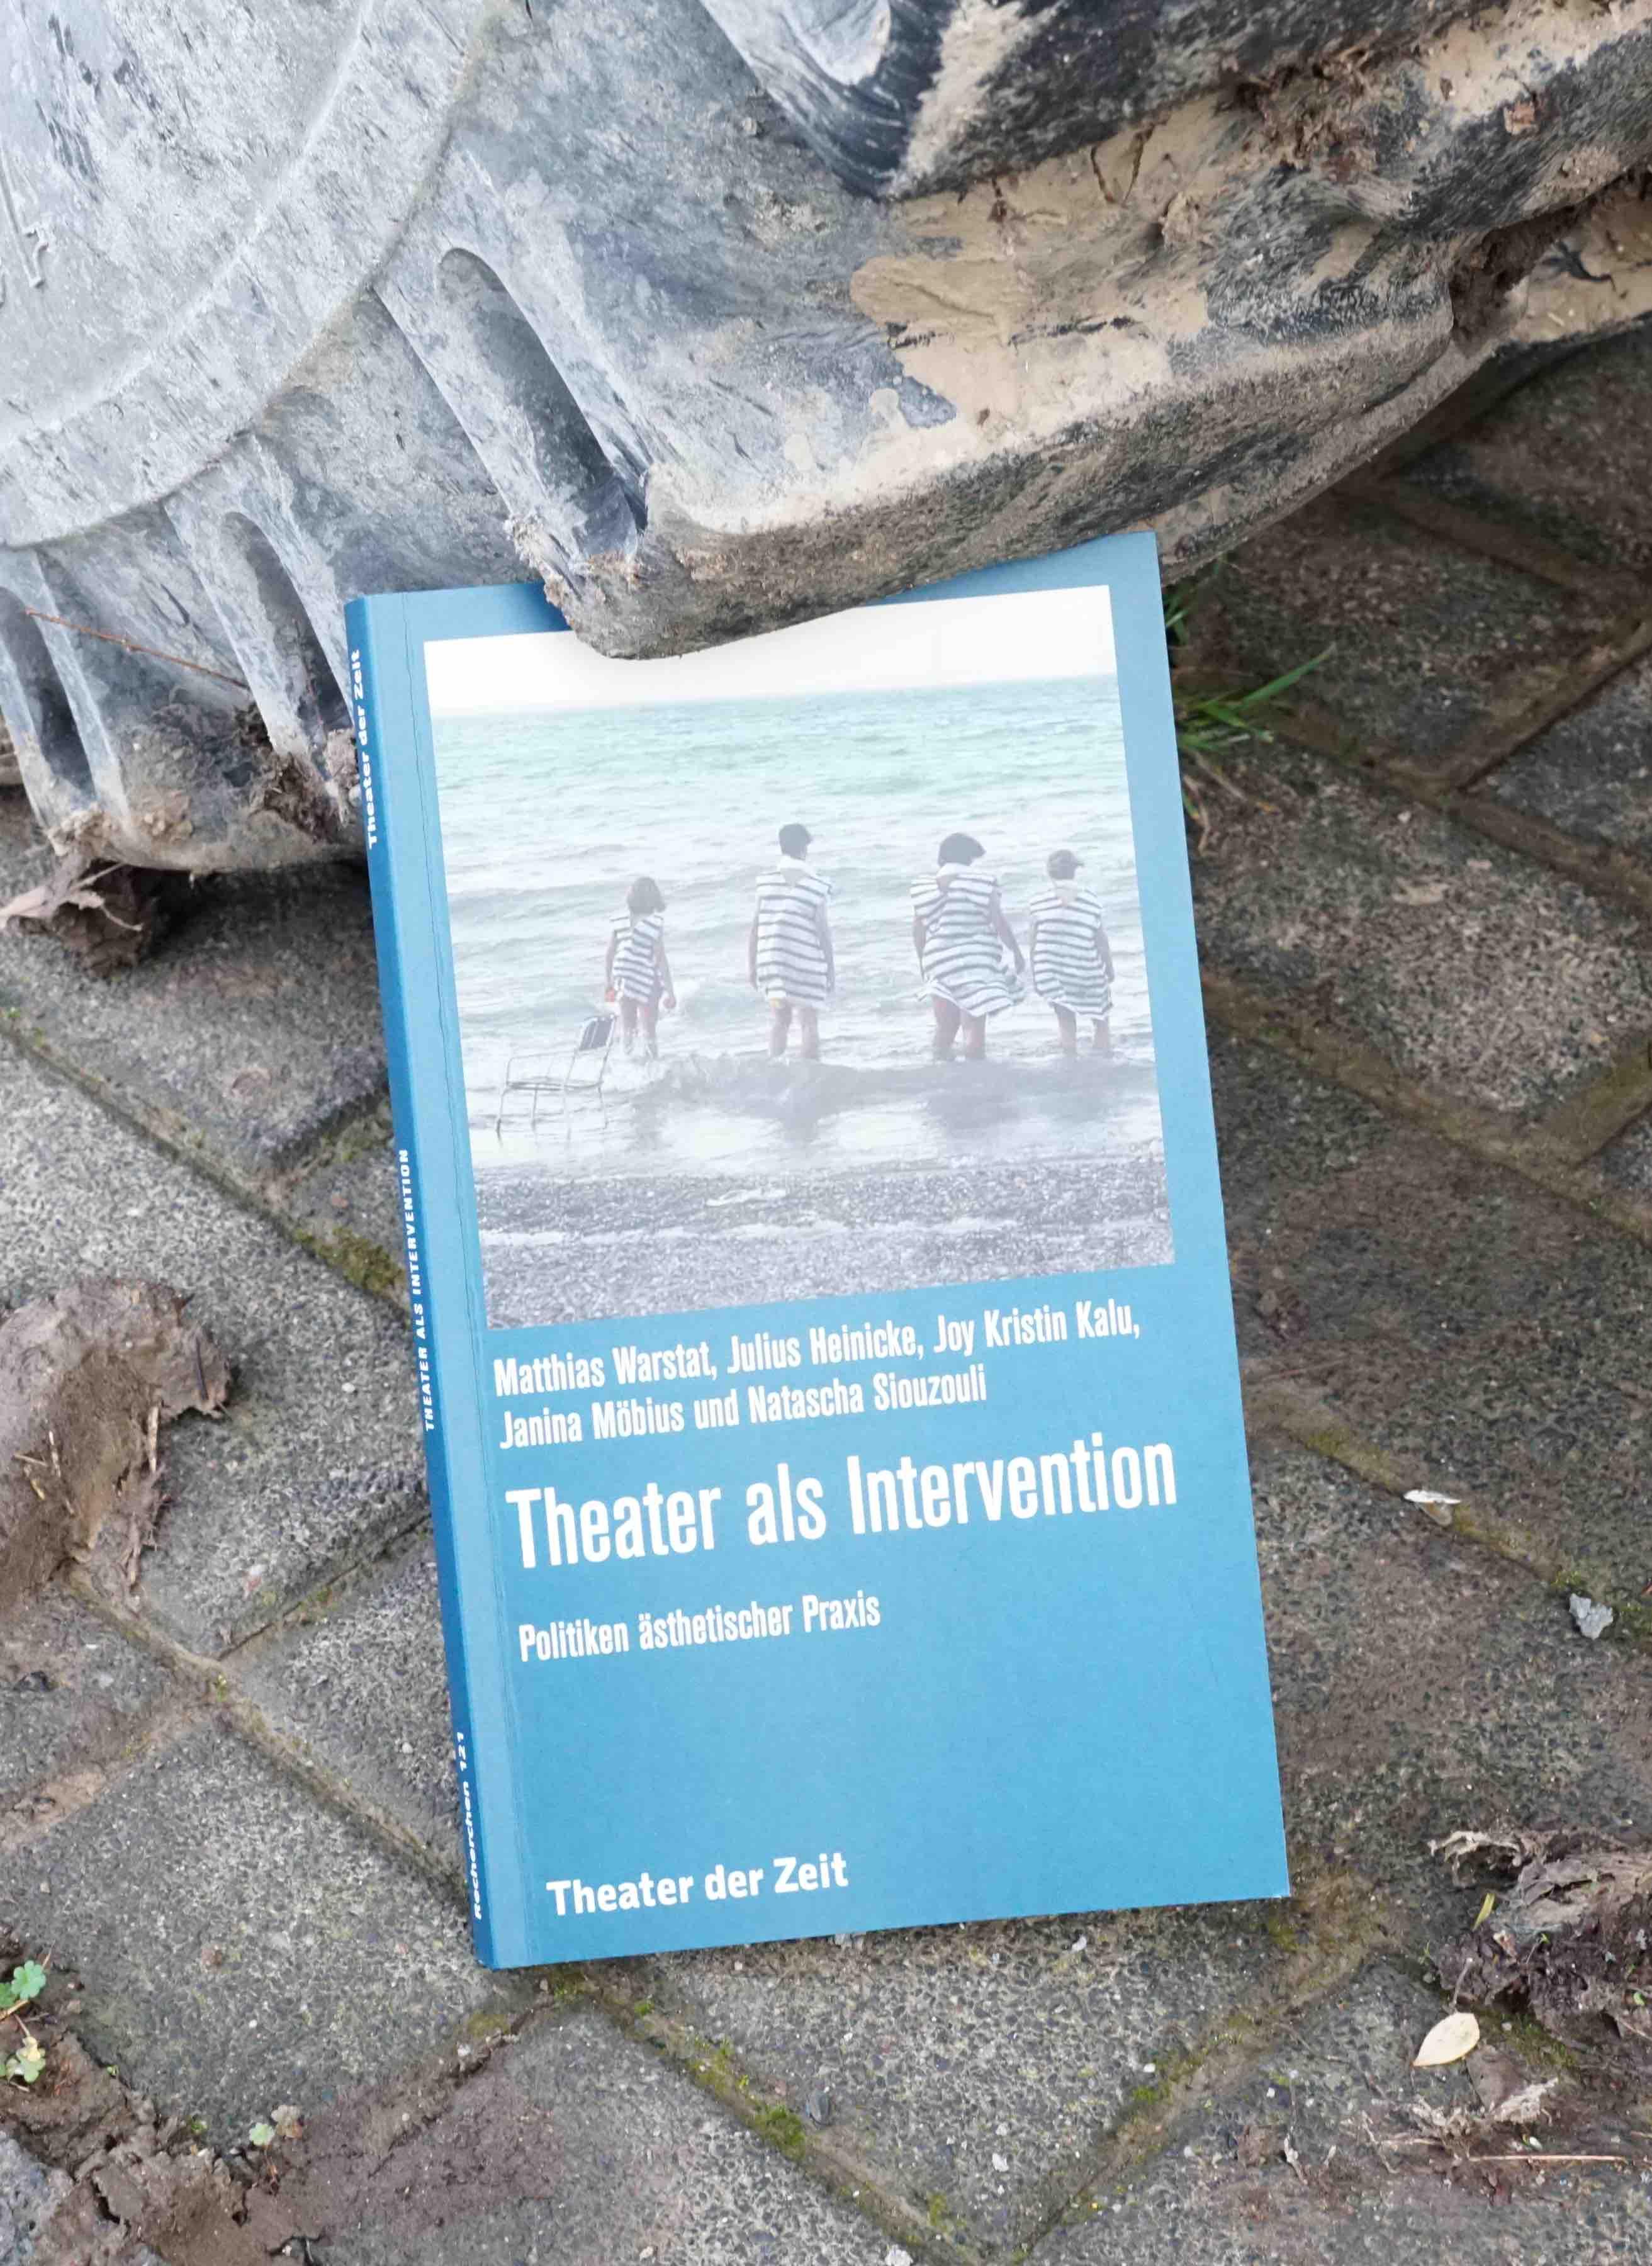 Warstat u.a. (Hg) 2015: Theater als Intervention – Rezension